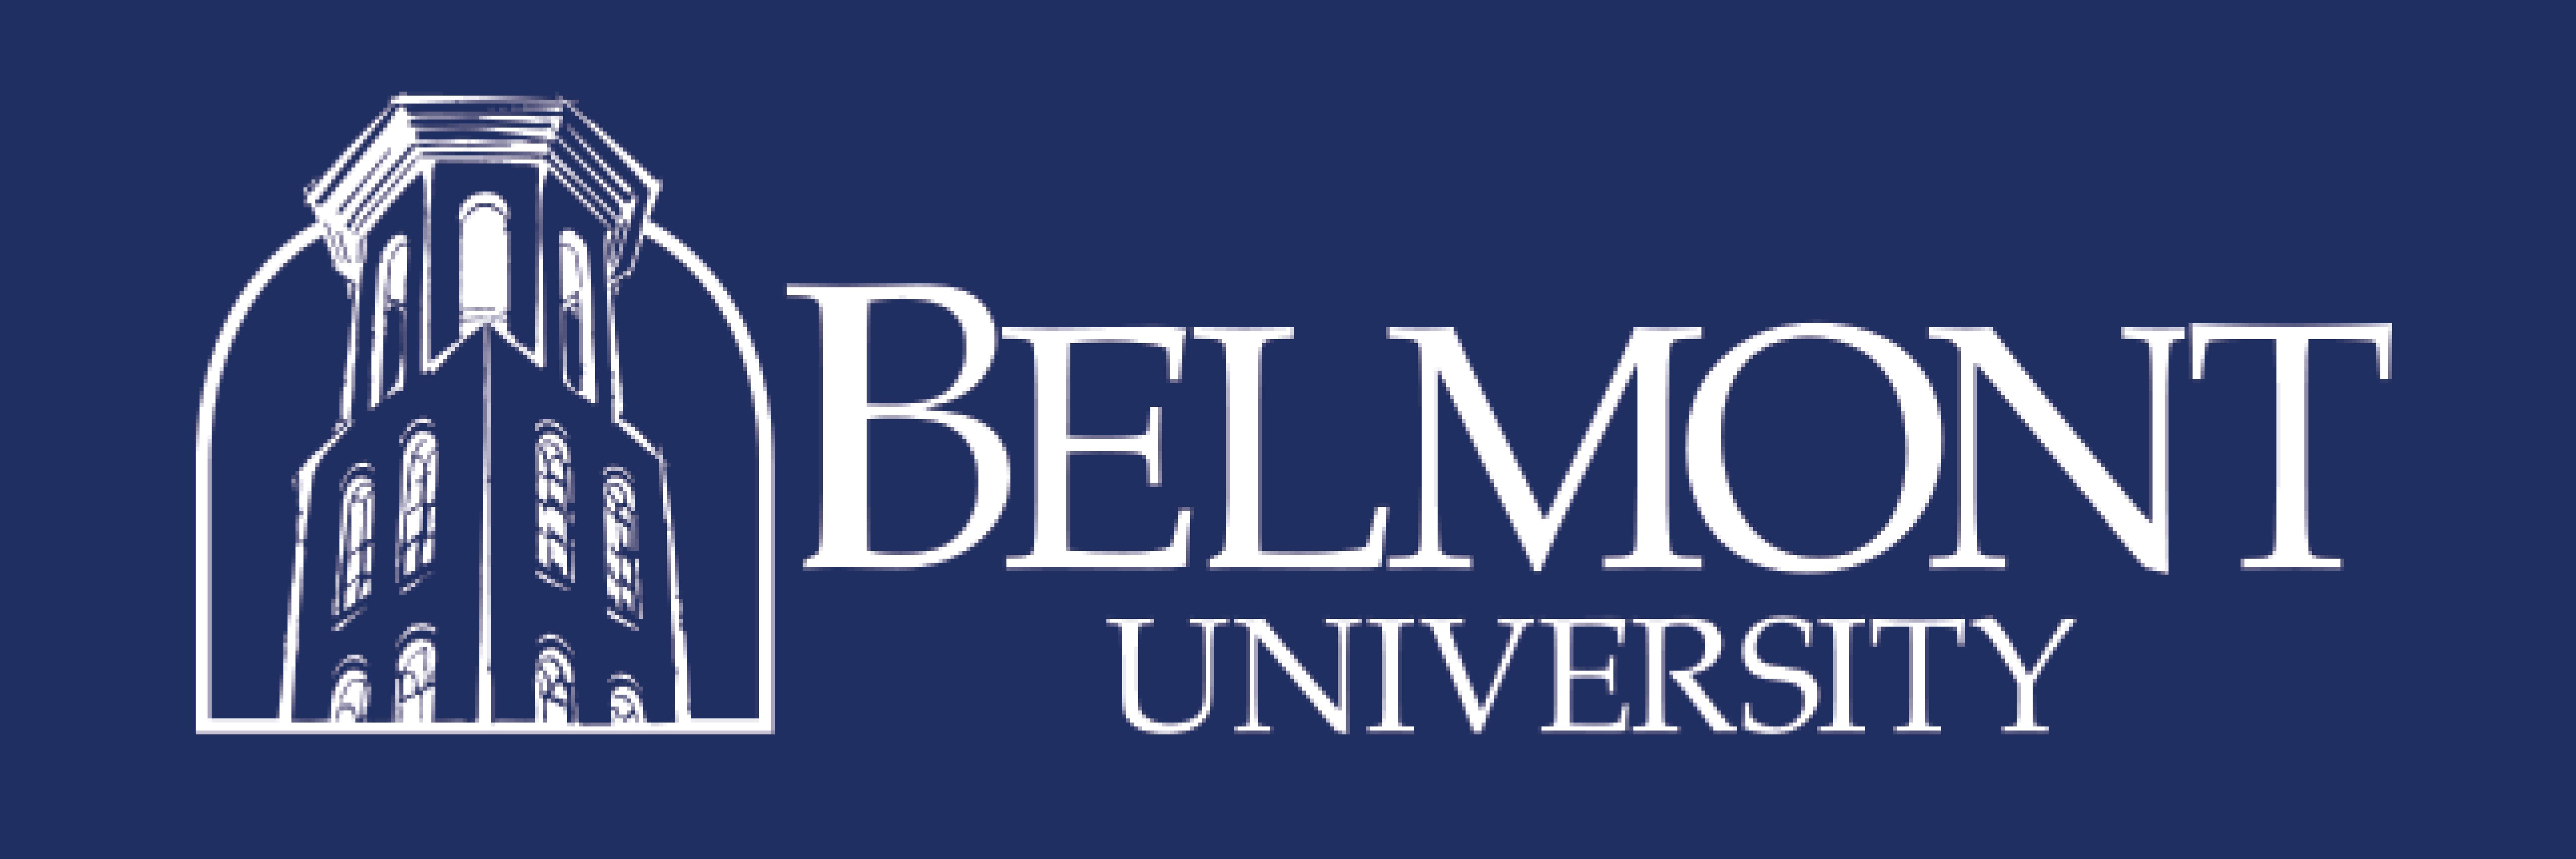 Belmont-University-Header